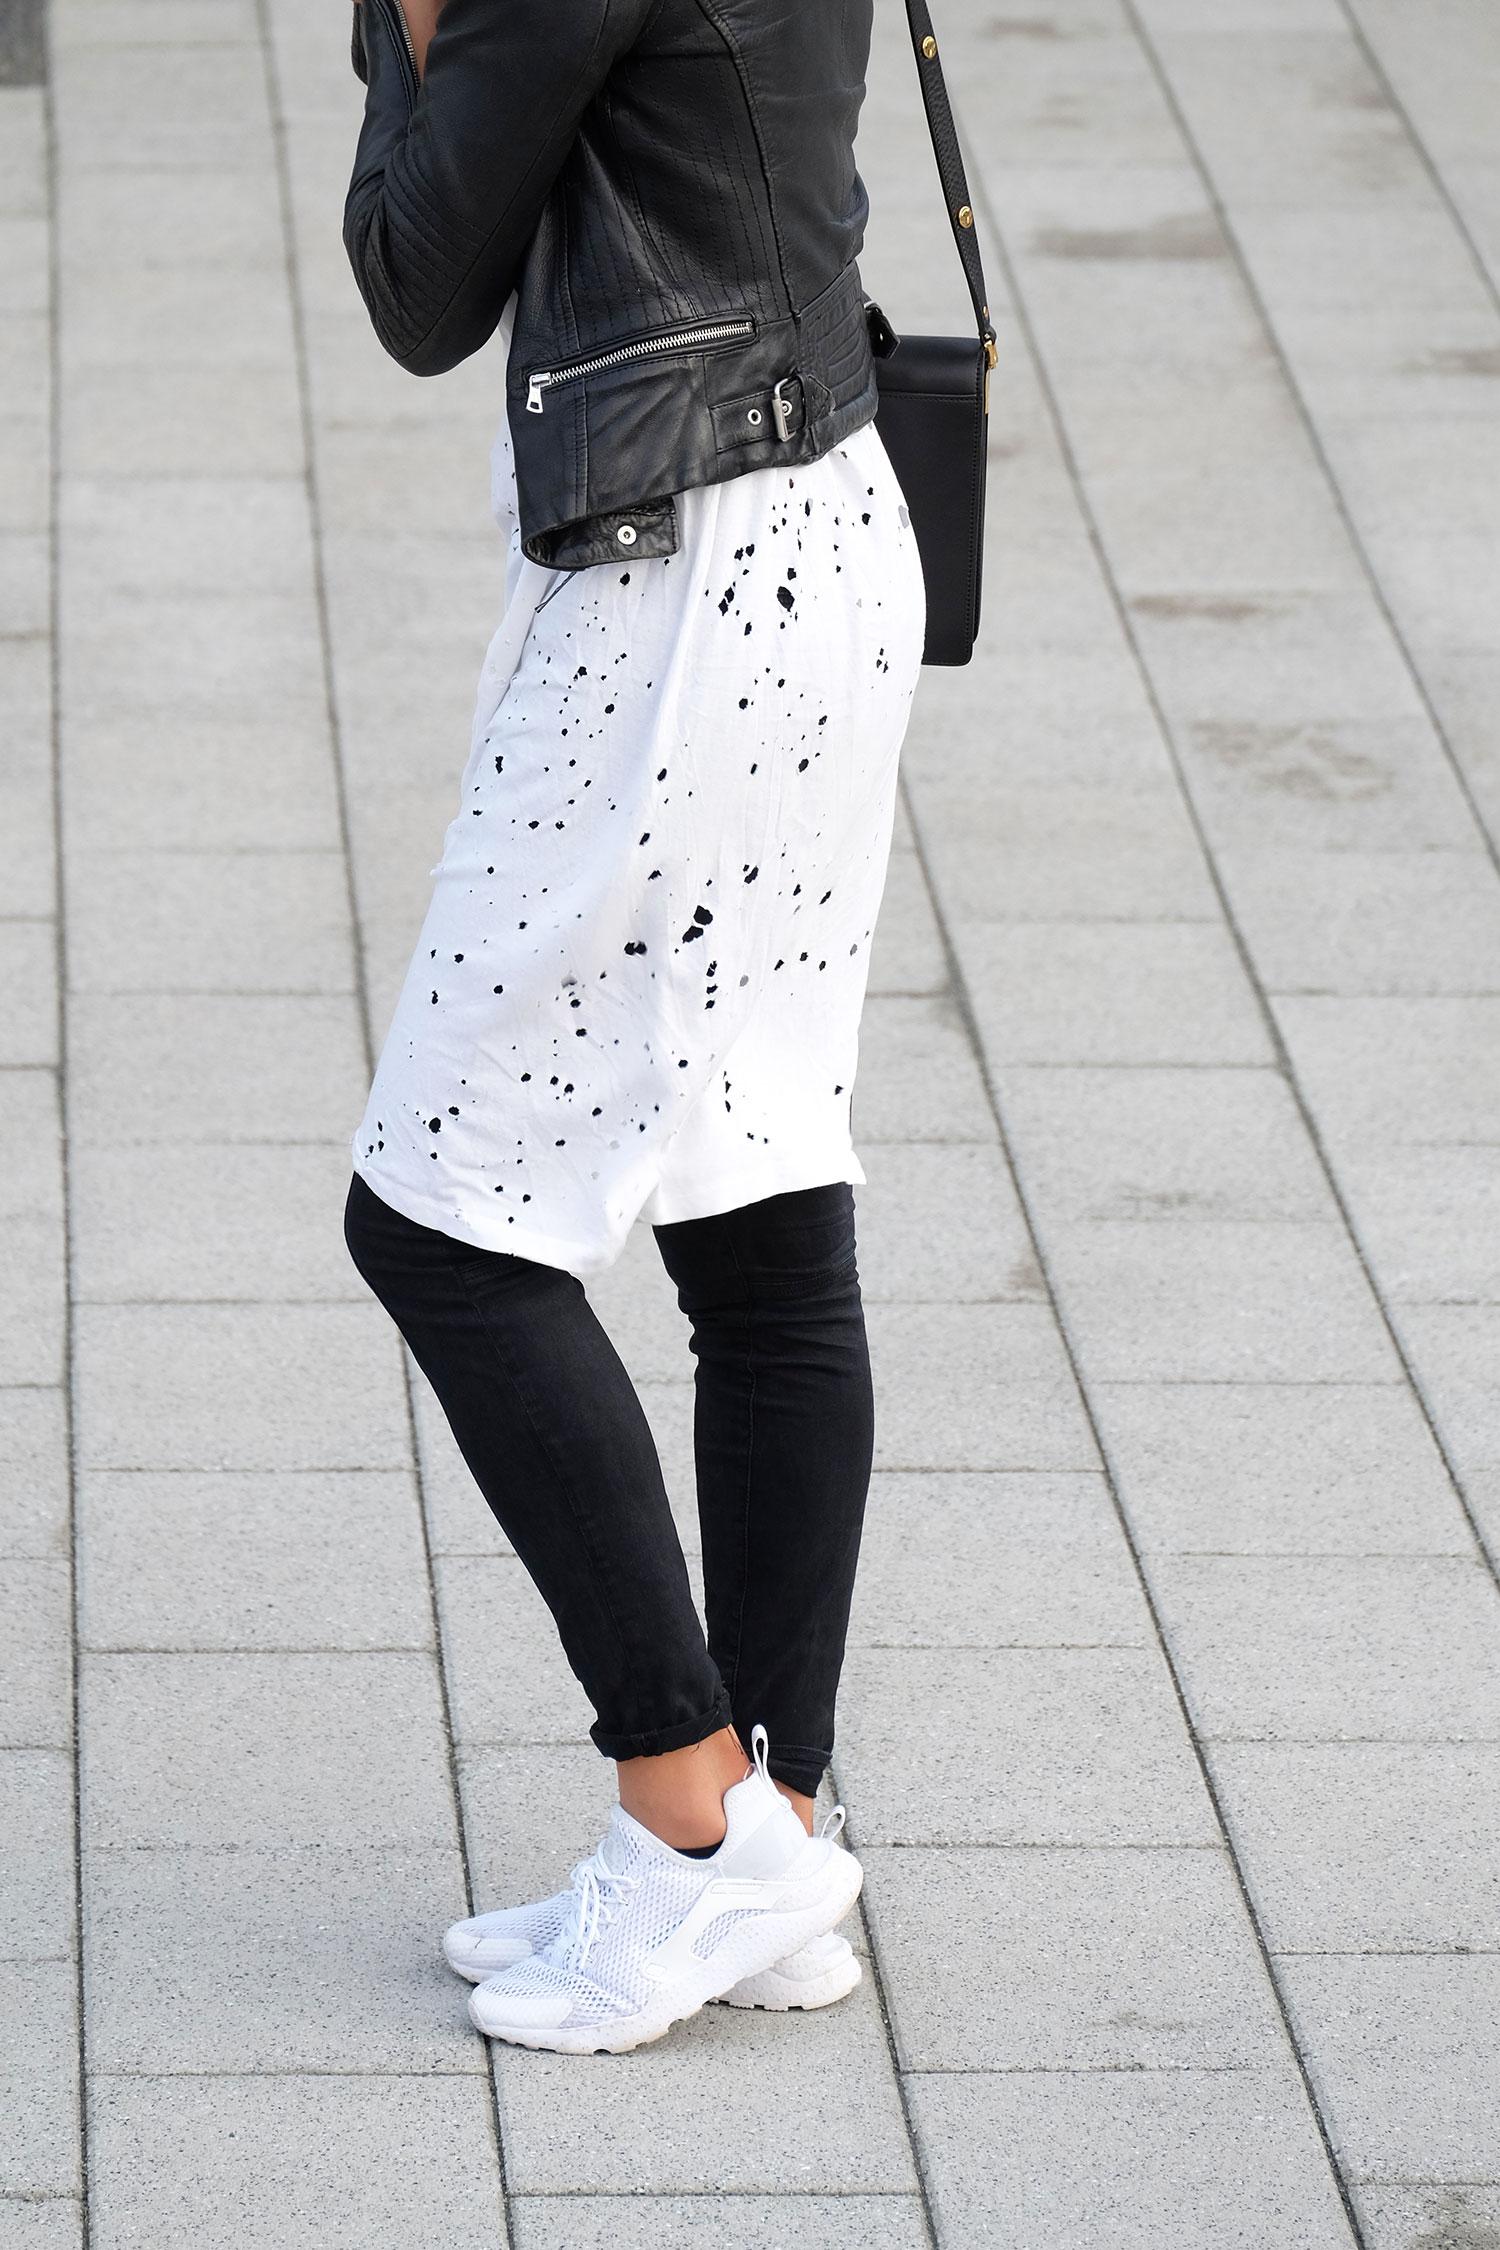 curls-all-over-fashionblogger-hamburg